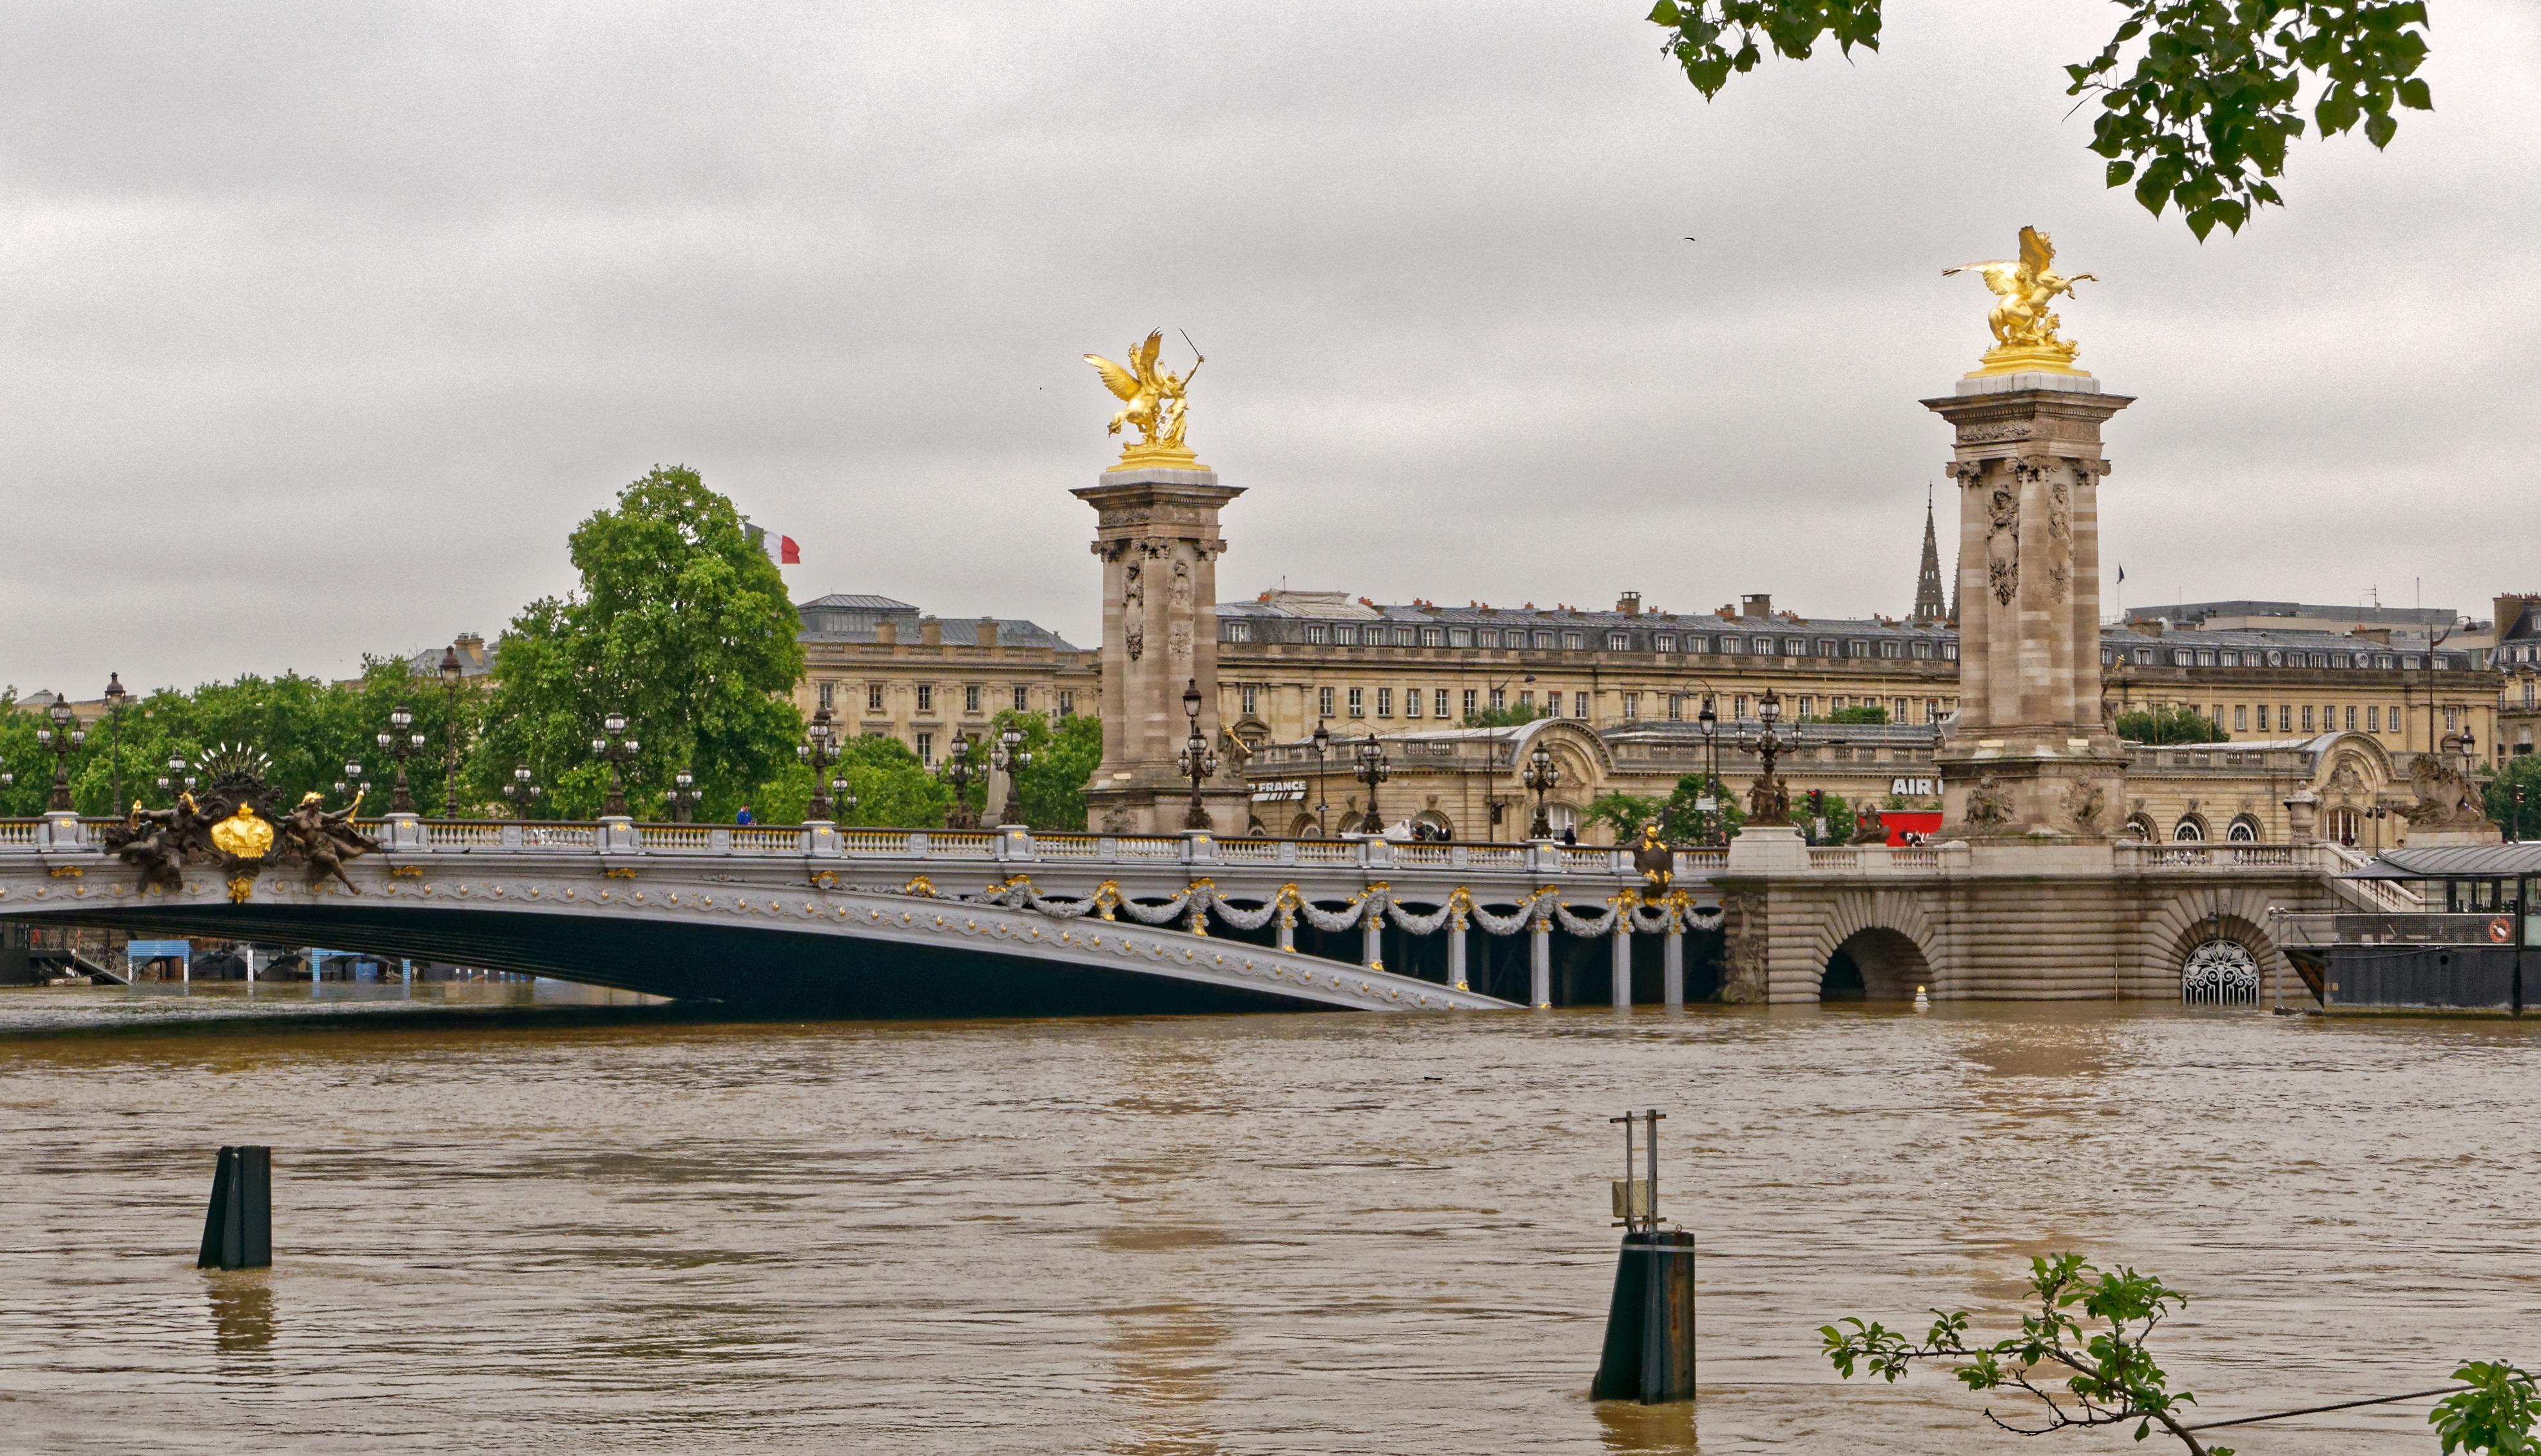 Pont De Lit 140 2016 european floods - wikipedia